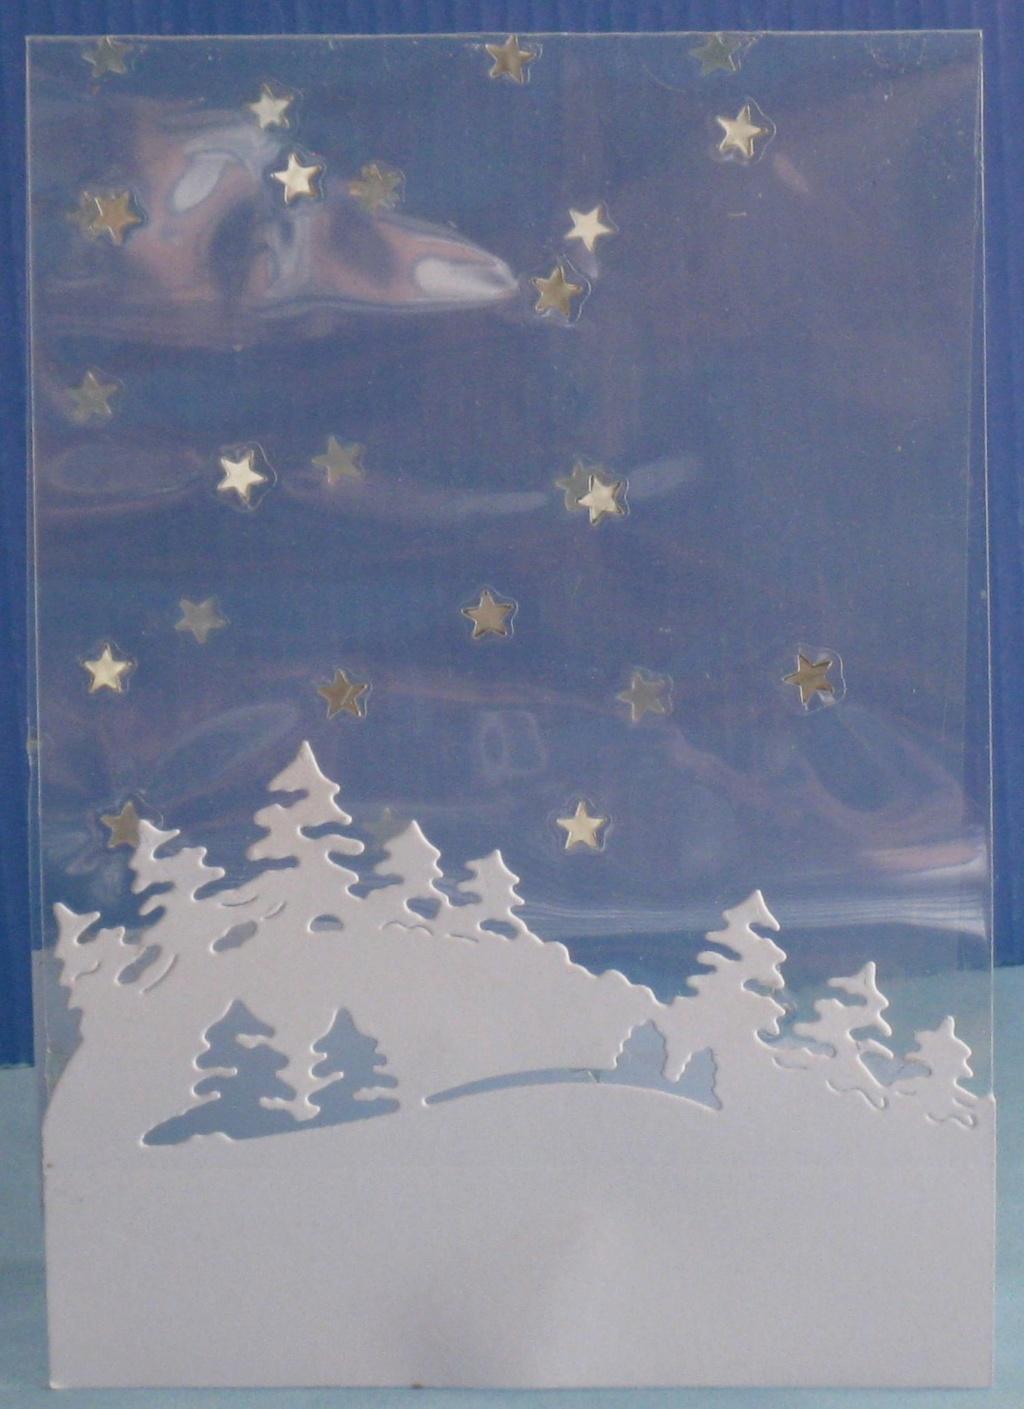 CC attend Noël (mis à jour 24-12) Img_0035